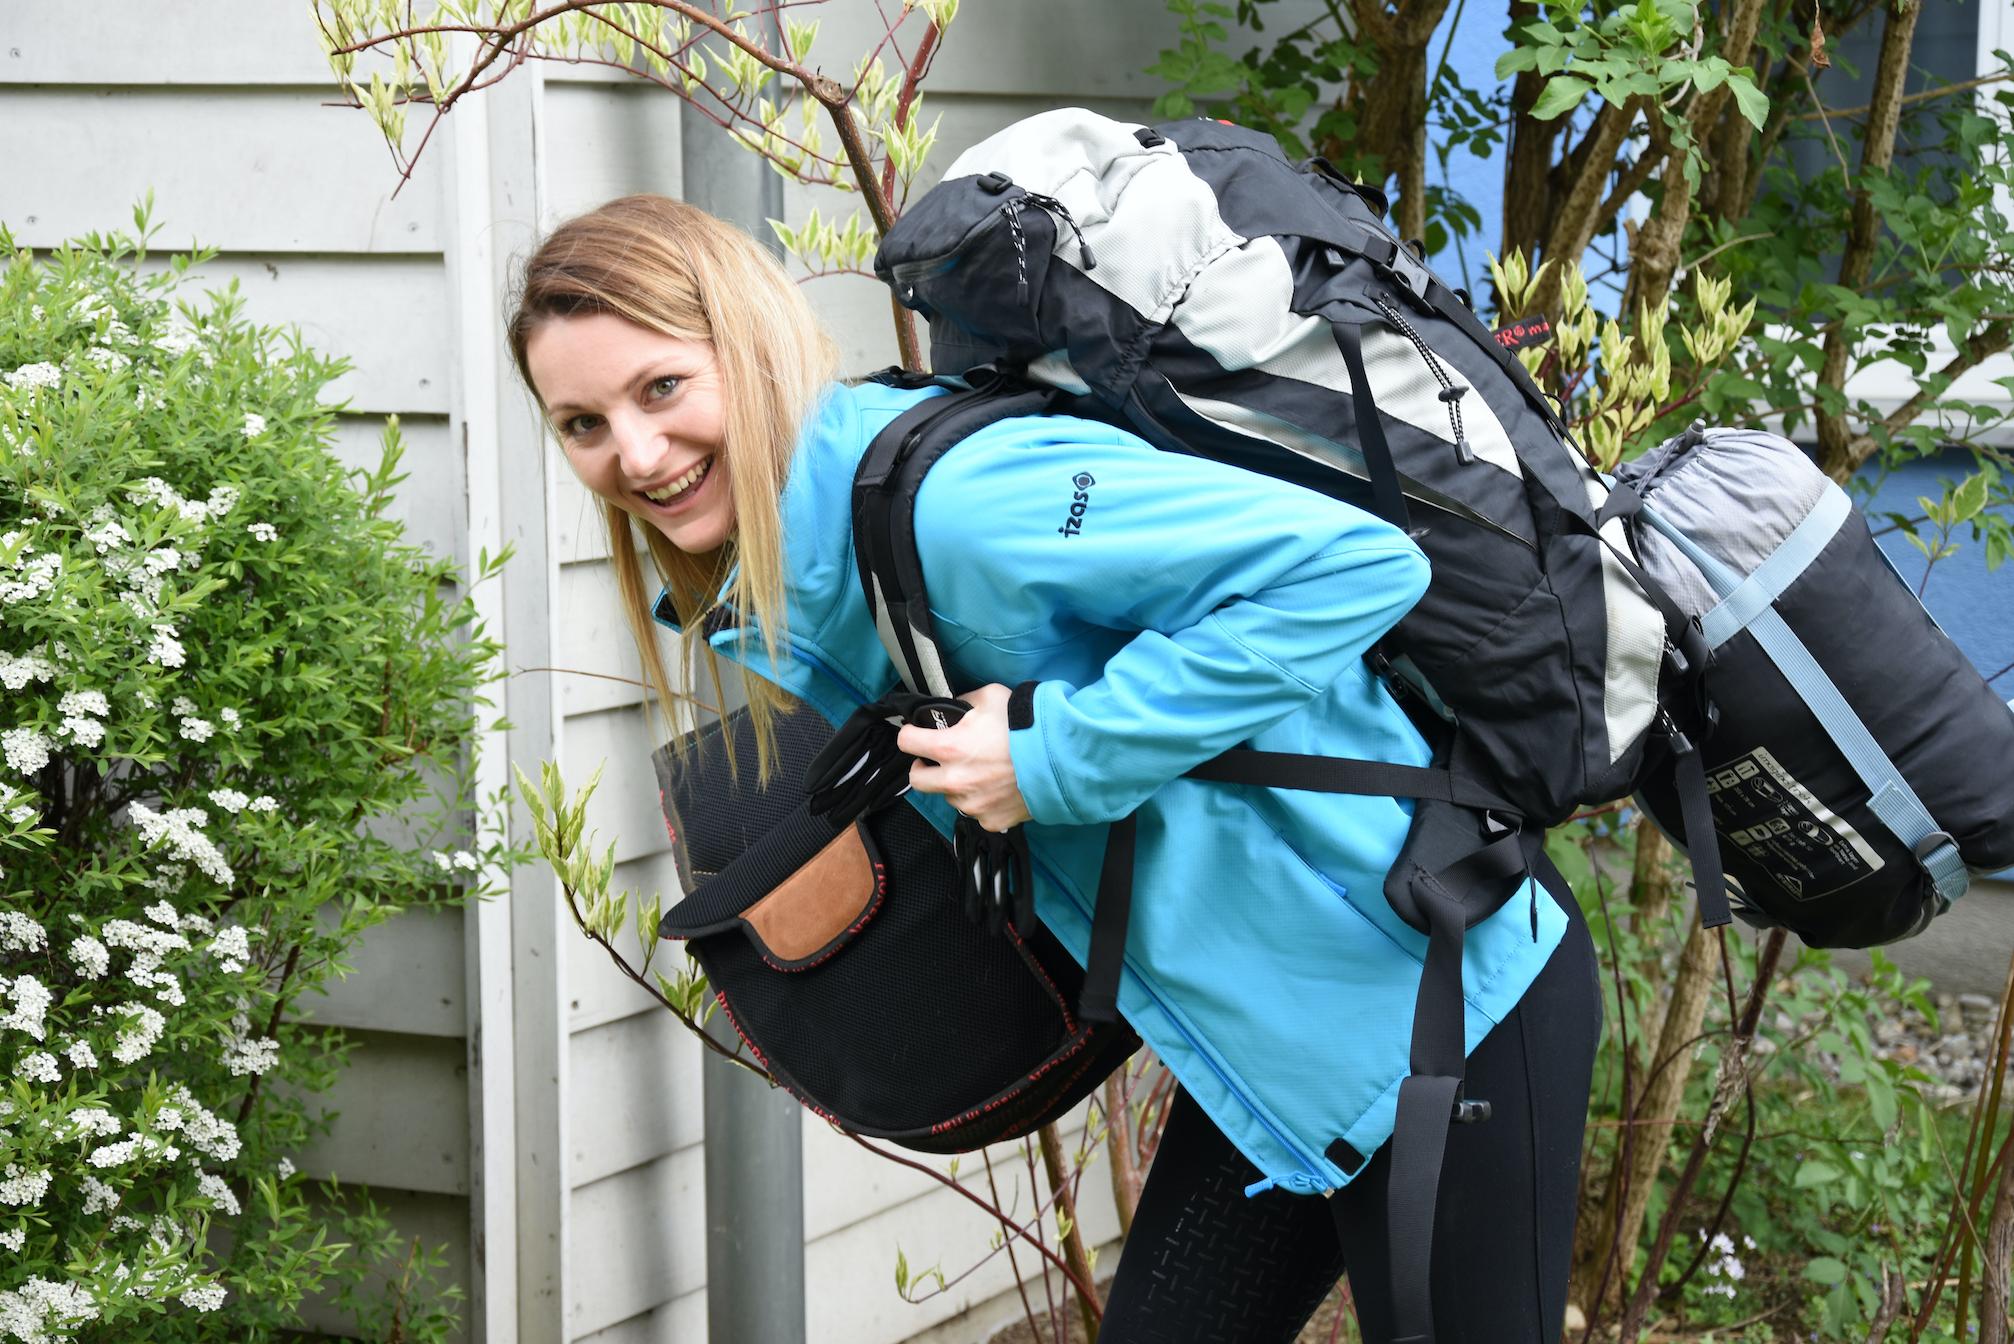 Hilfe! 2 Tage Wanderritt - Was brauche ich denn alles? Foto: Haflinger Austria